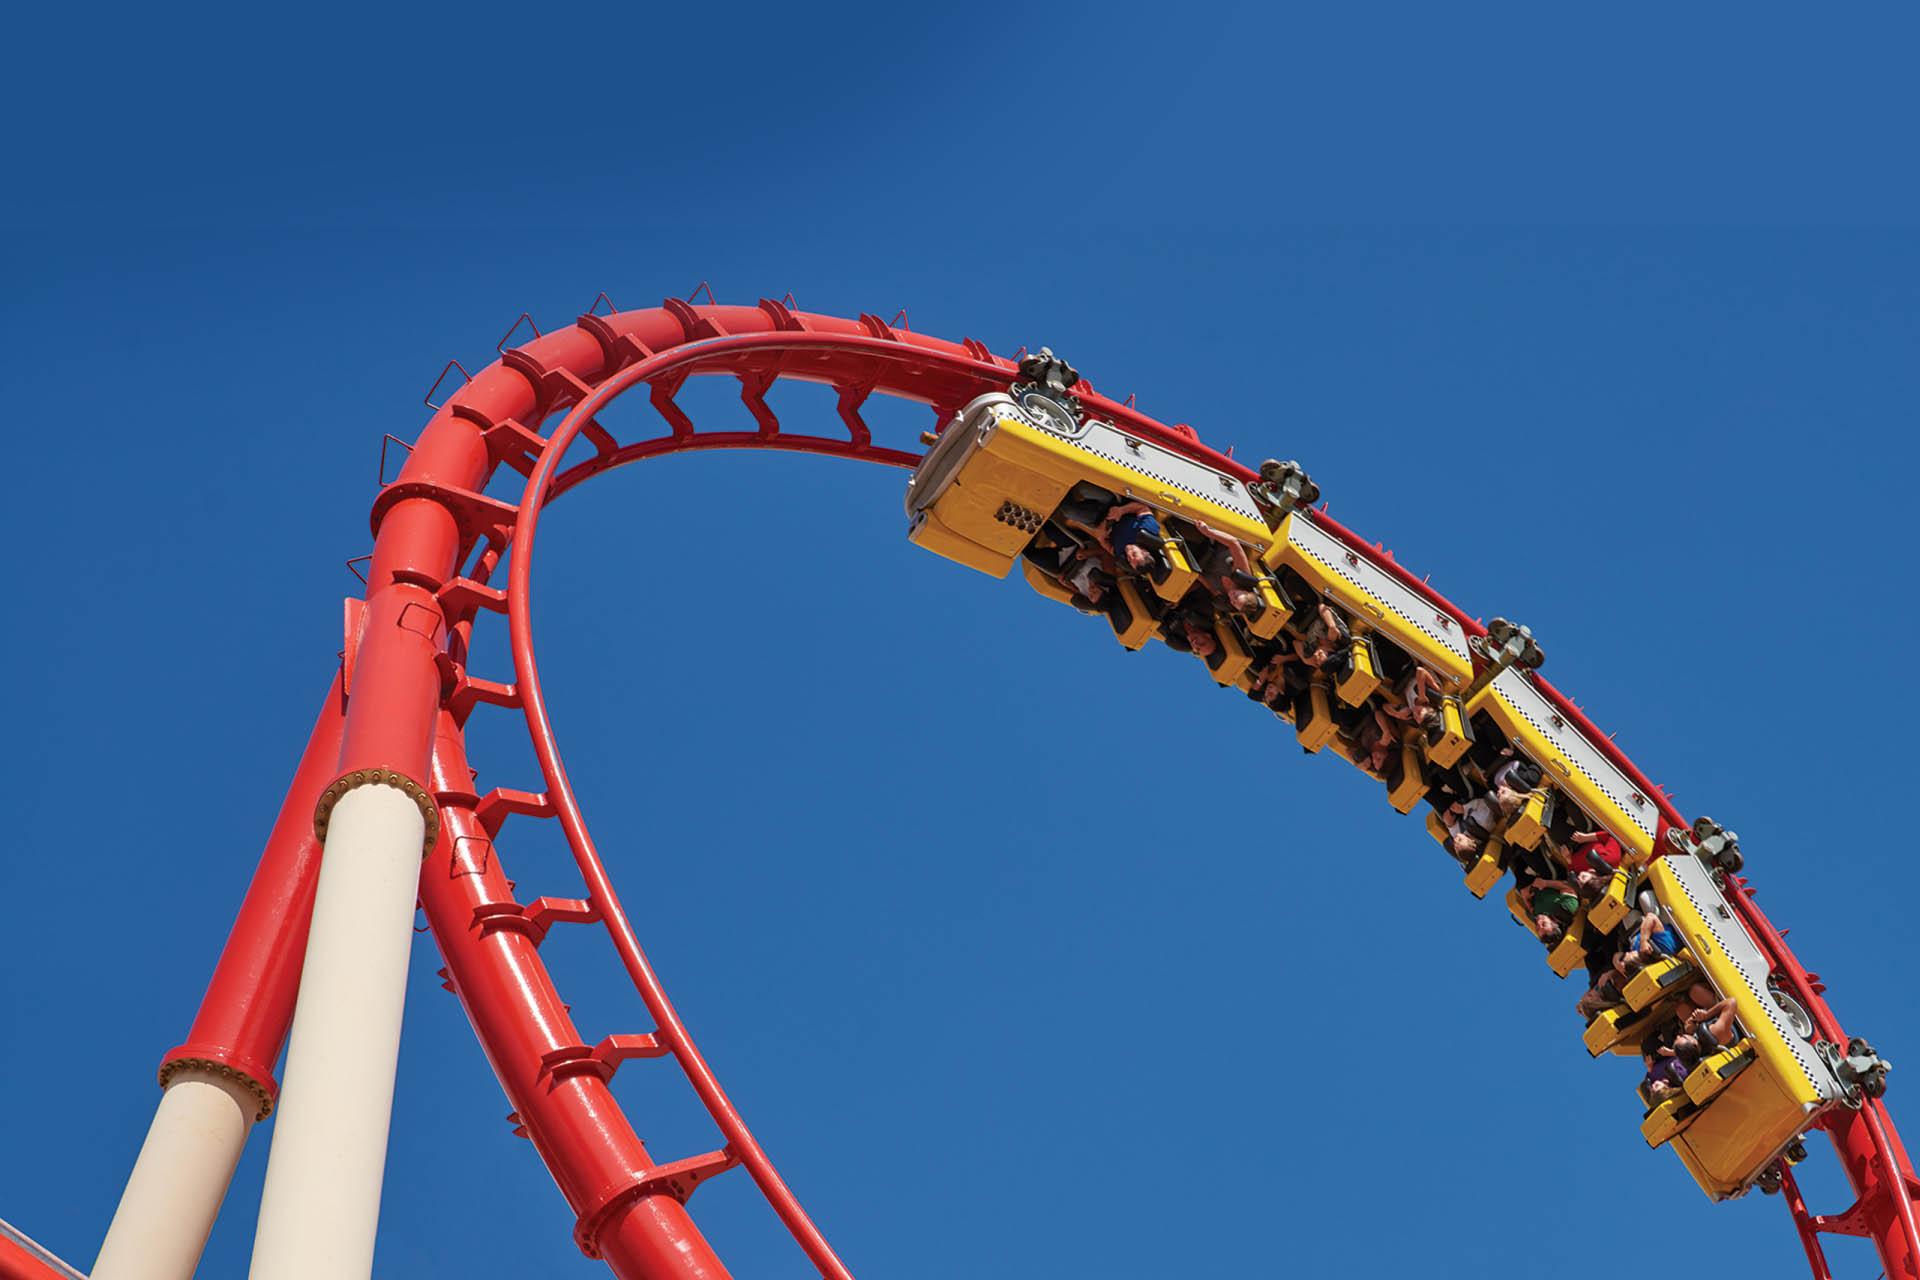 BG_Big_Apple_Coaster_Attraction